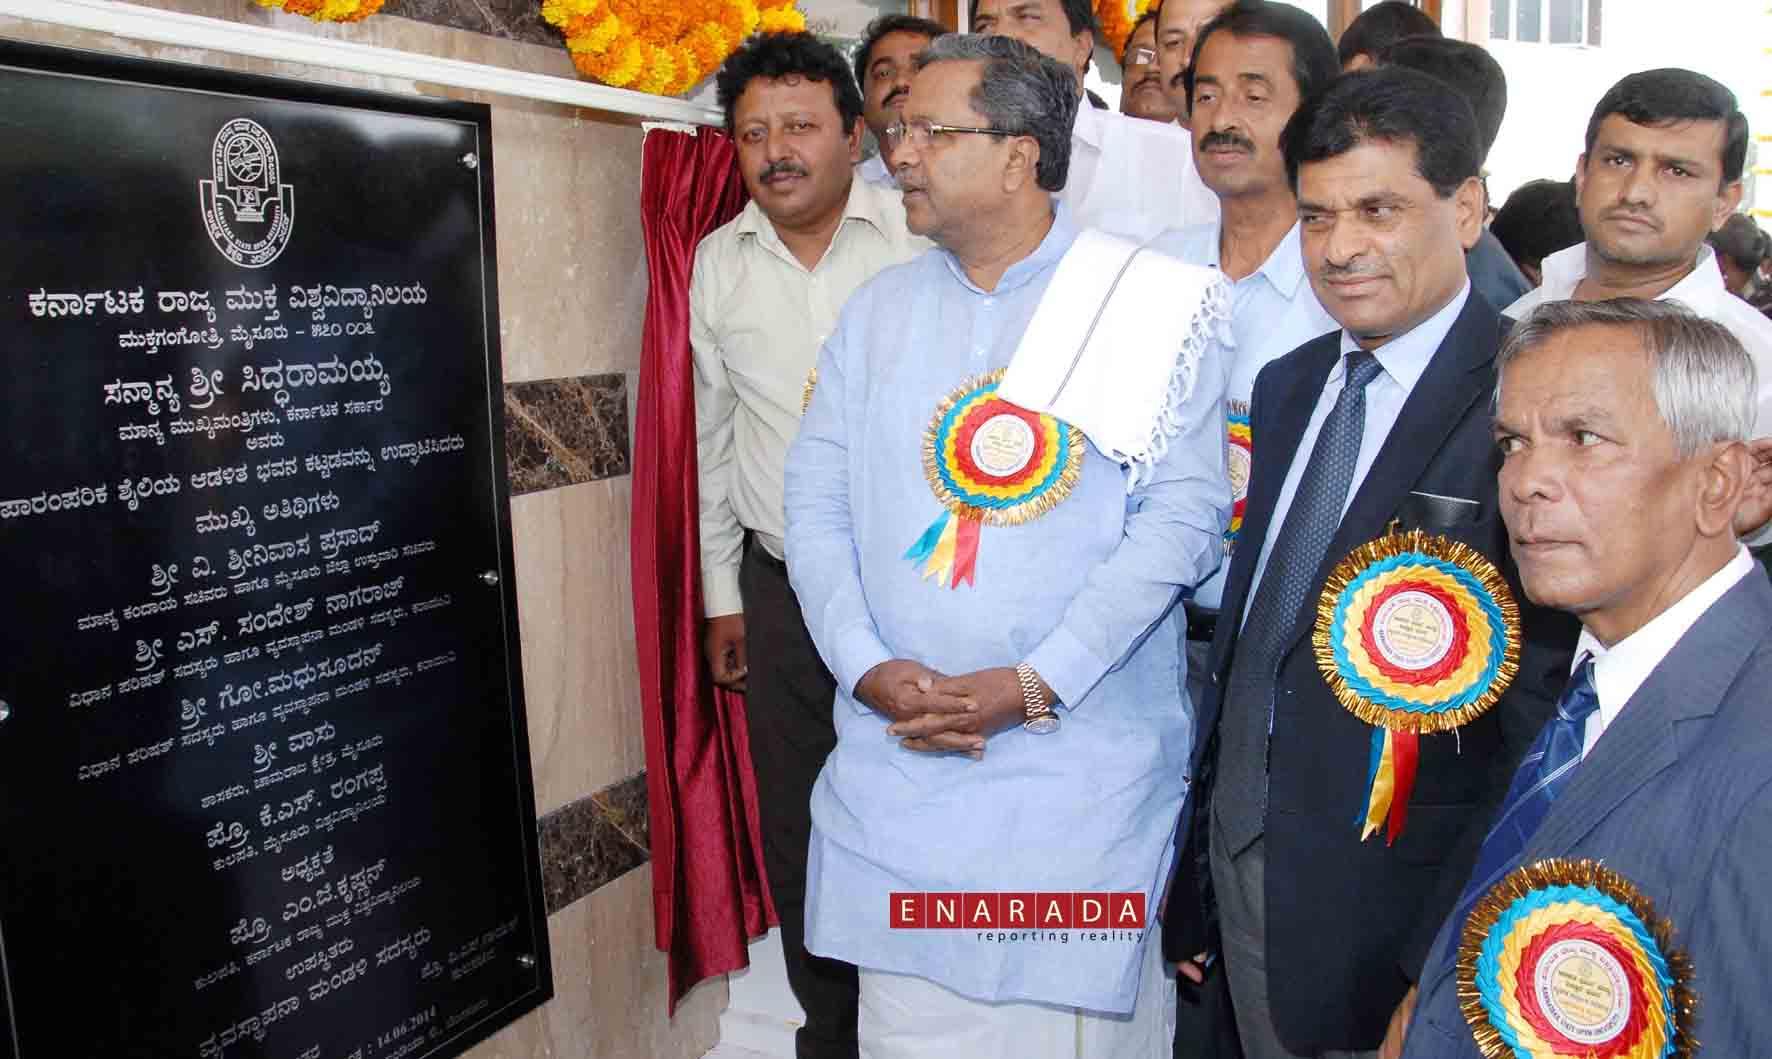 Chief Minister Siddaramaih inaugurates new buildings of KSOU. MLA Vasu, Mysore University Vice-Chancellor Prof. K.S. Rangappa, KSOU Vice-Chancellor Prof. M.G. Krishnan looks on